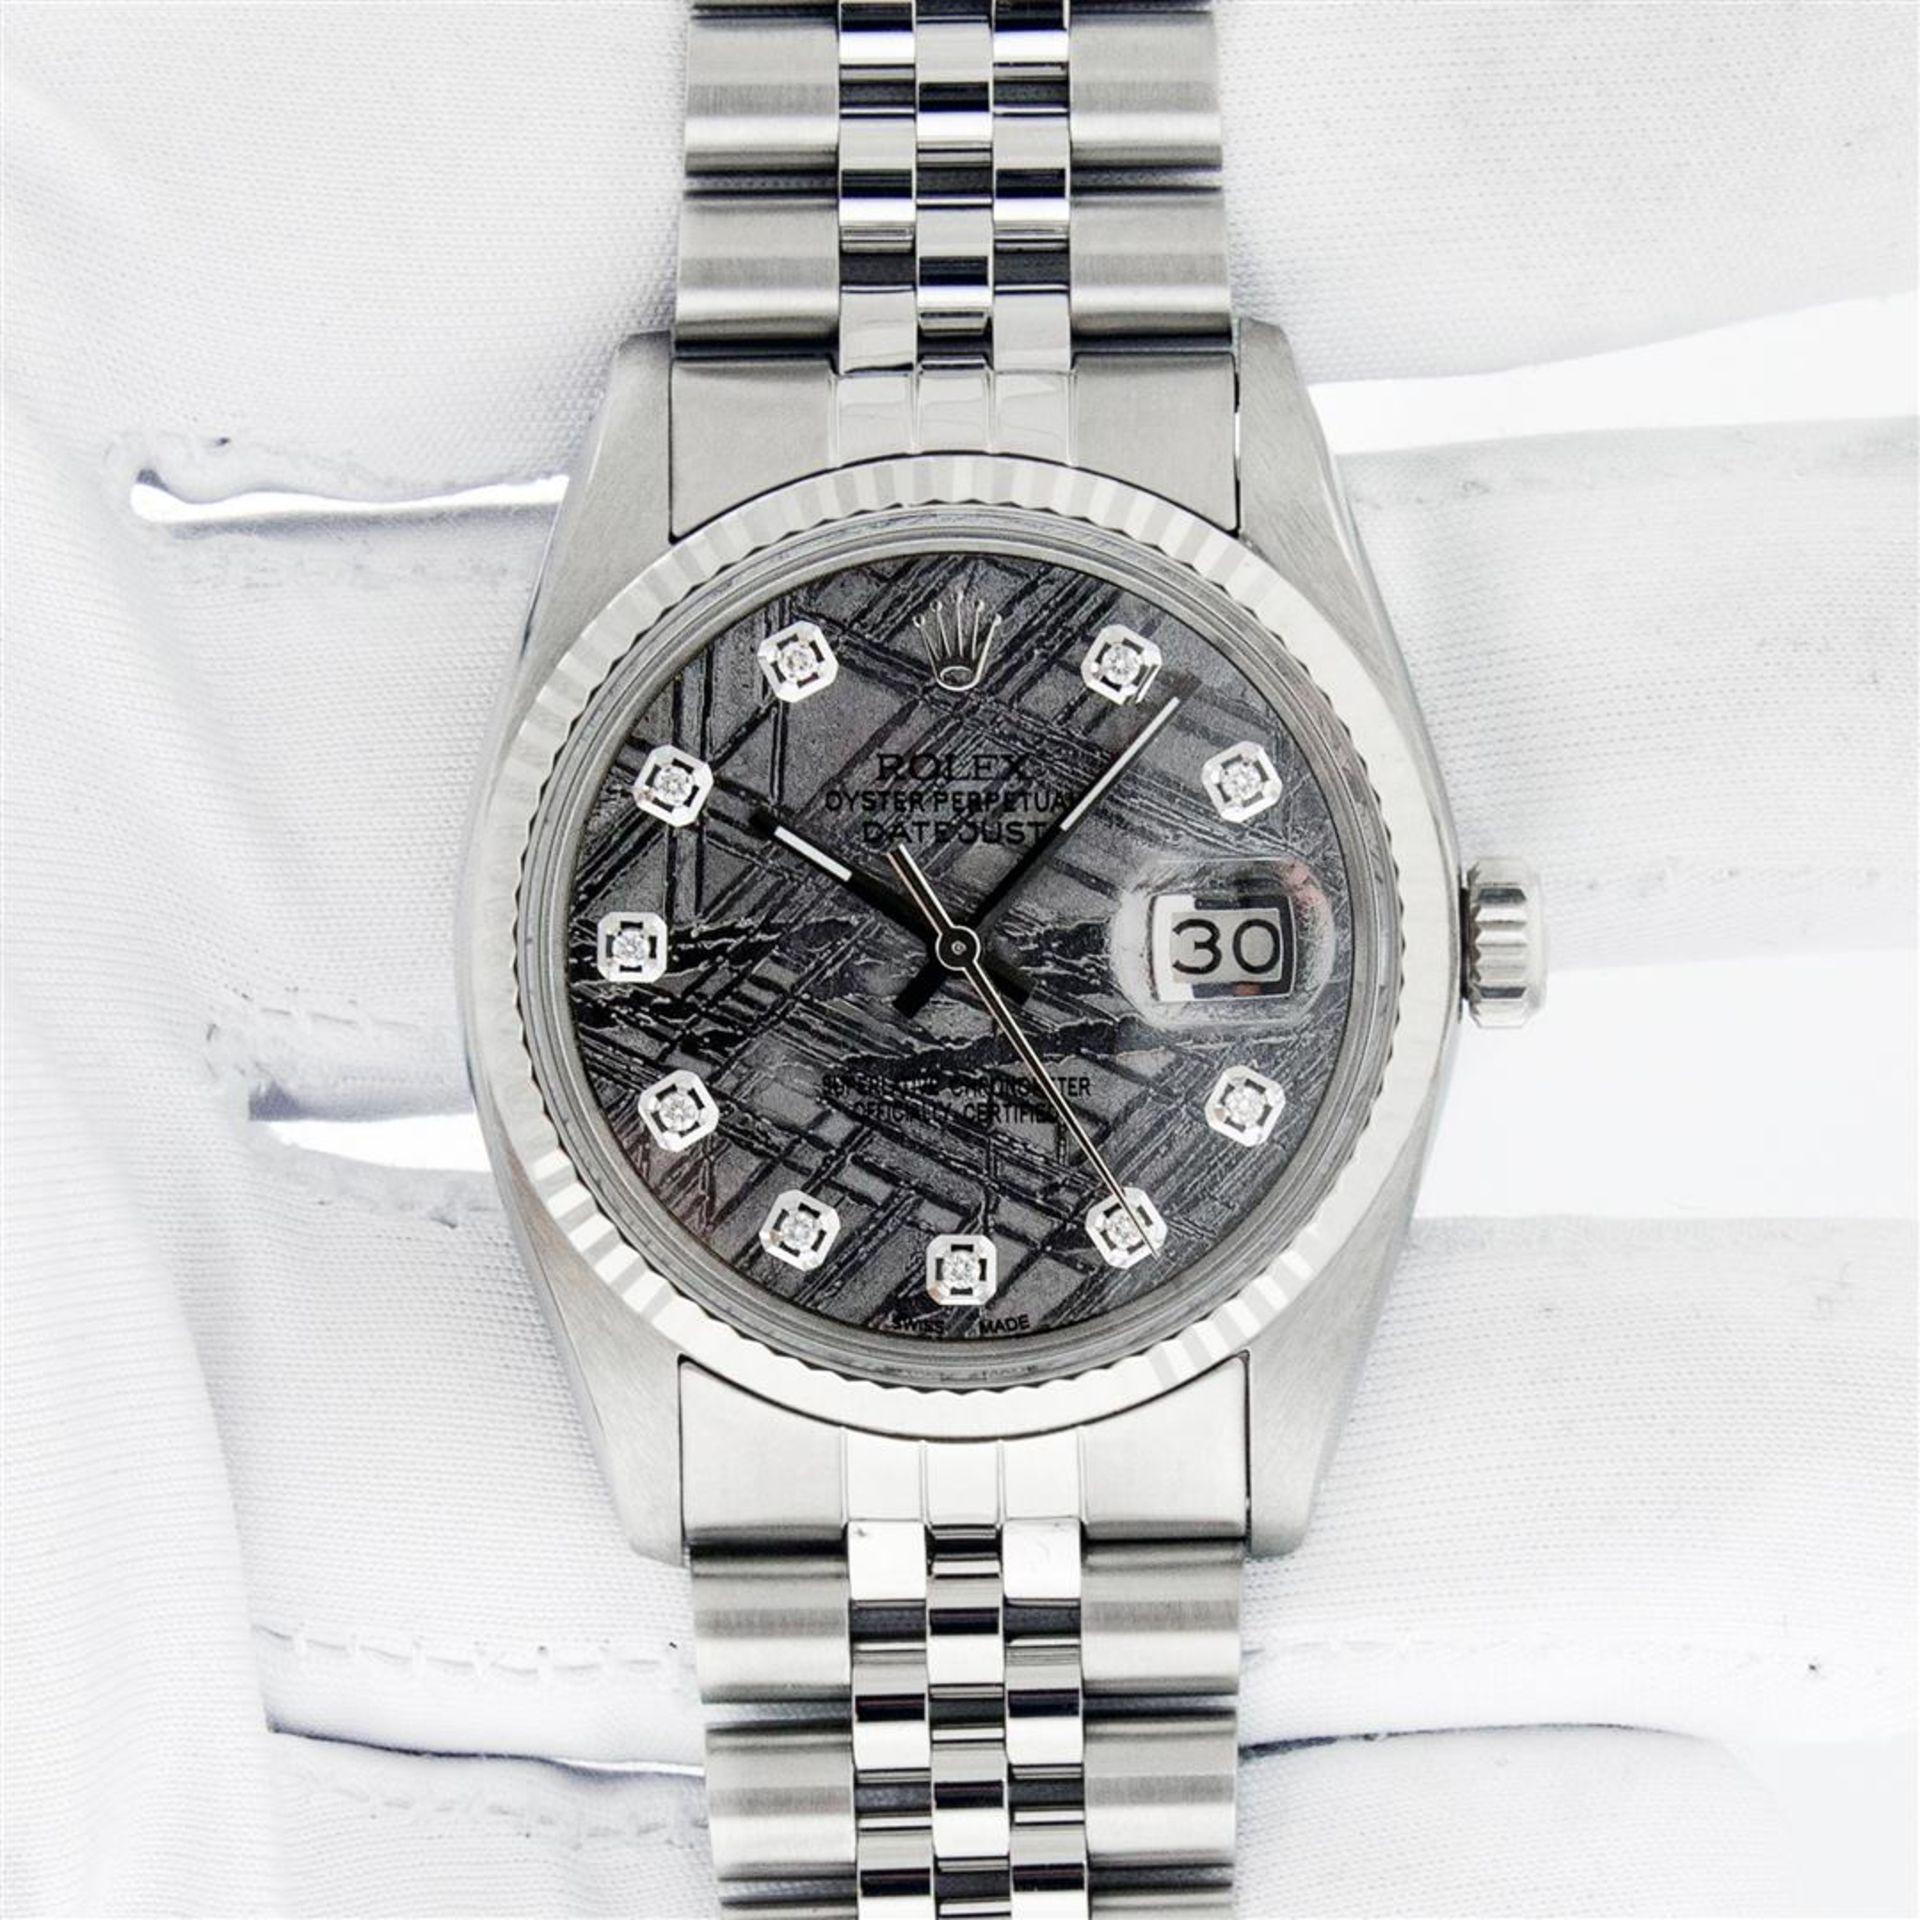 Rolex Mens Stainless Steel Meteorite Diamond 36MM Oyster Perpetual Datejust Wris - Image 2 of 9